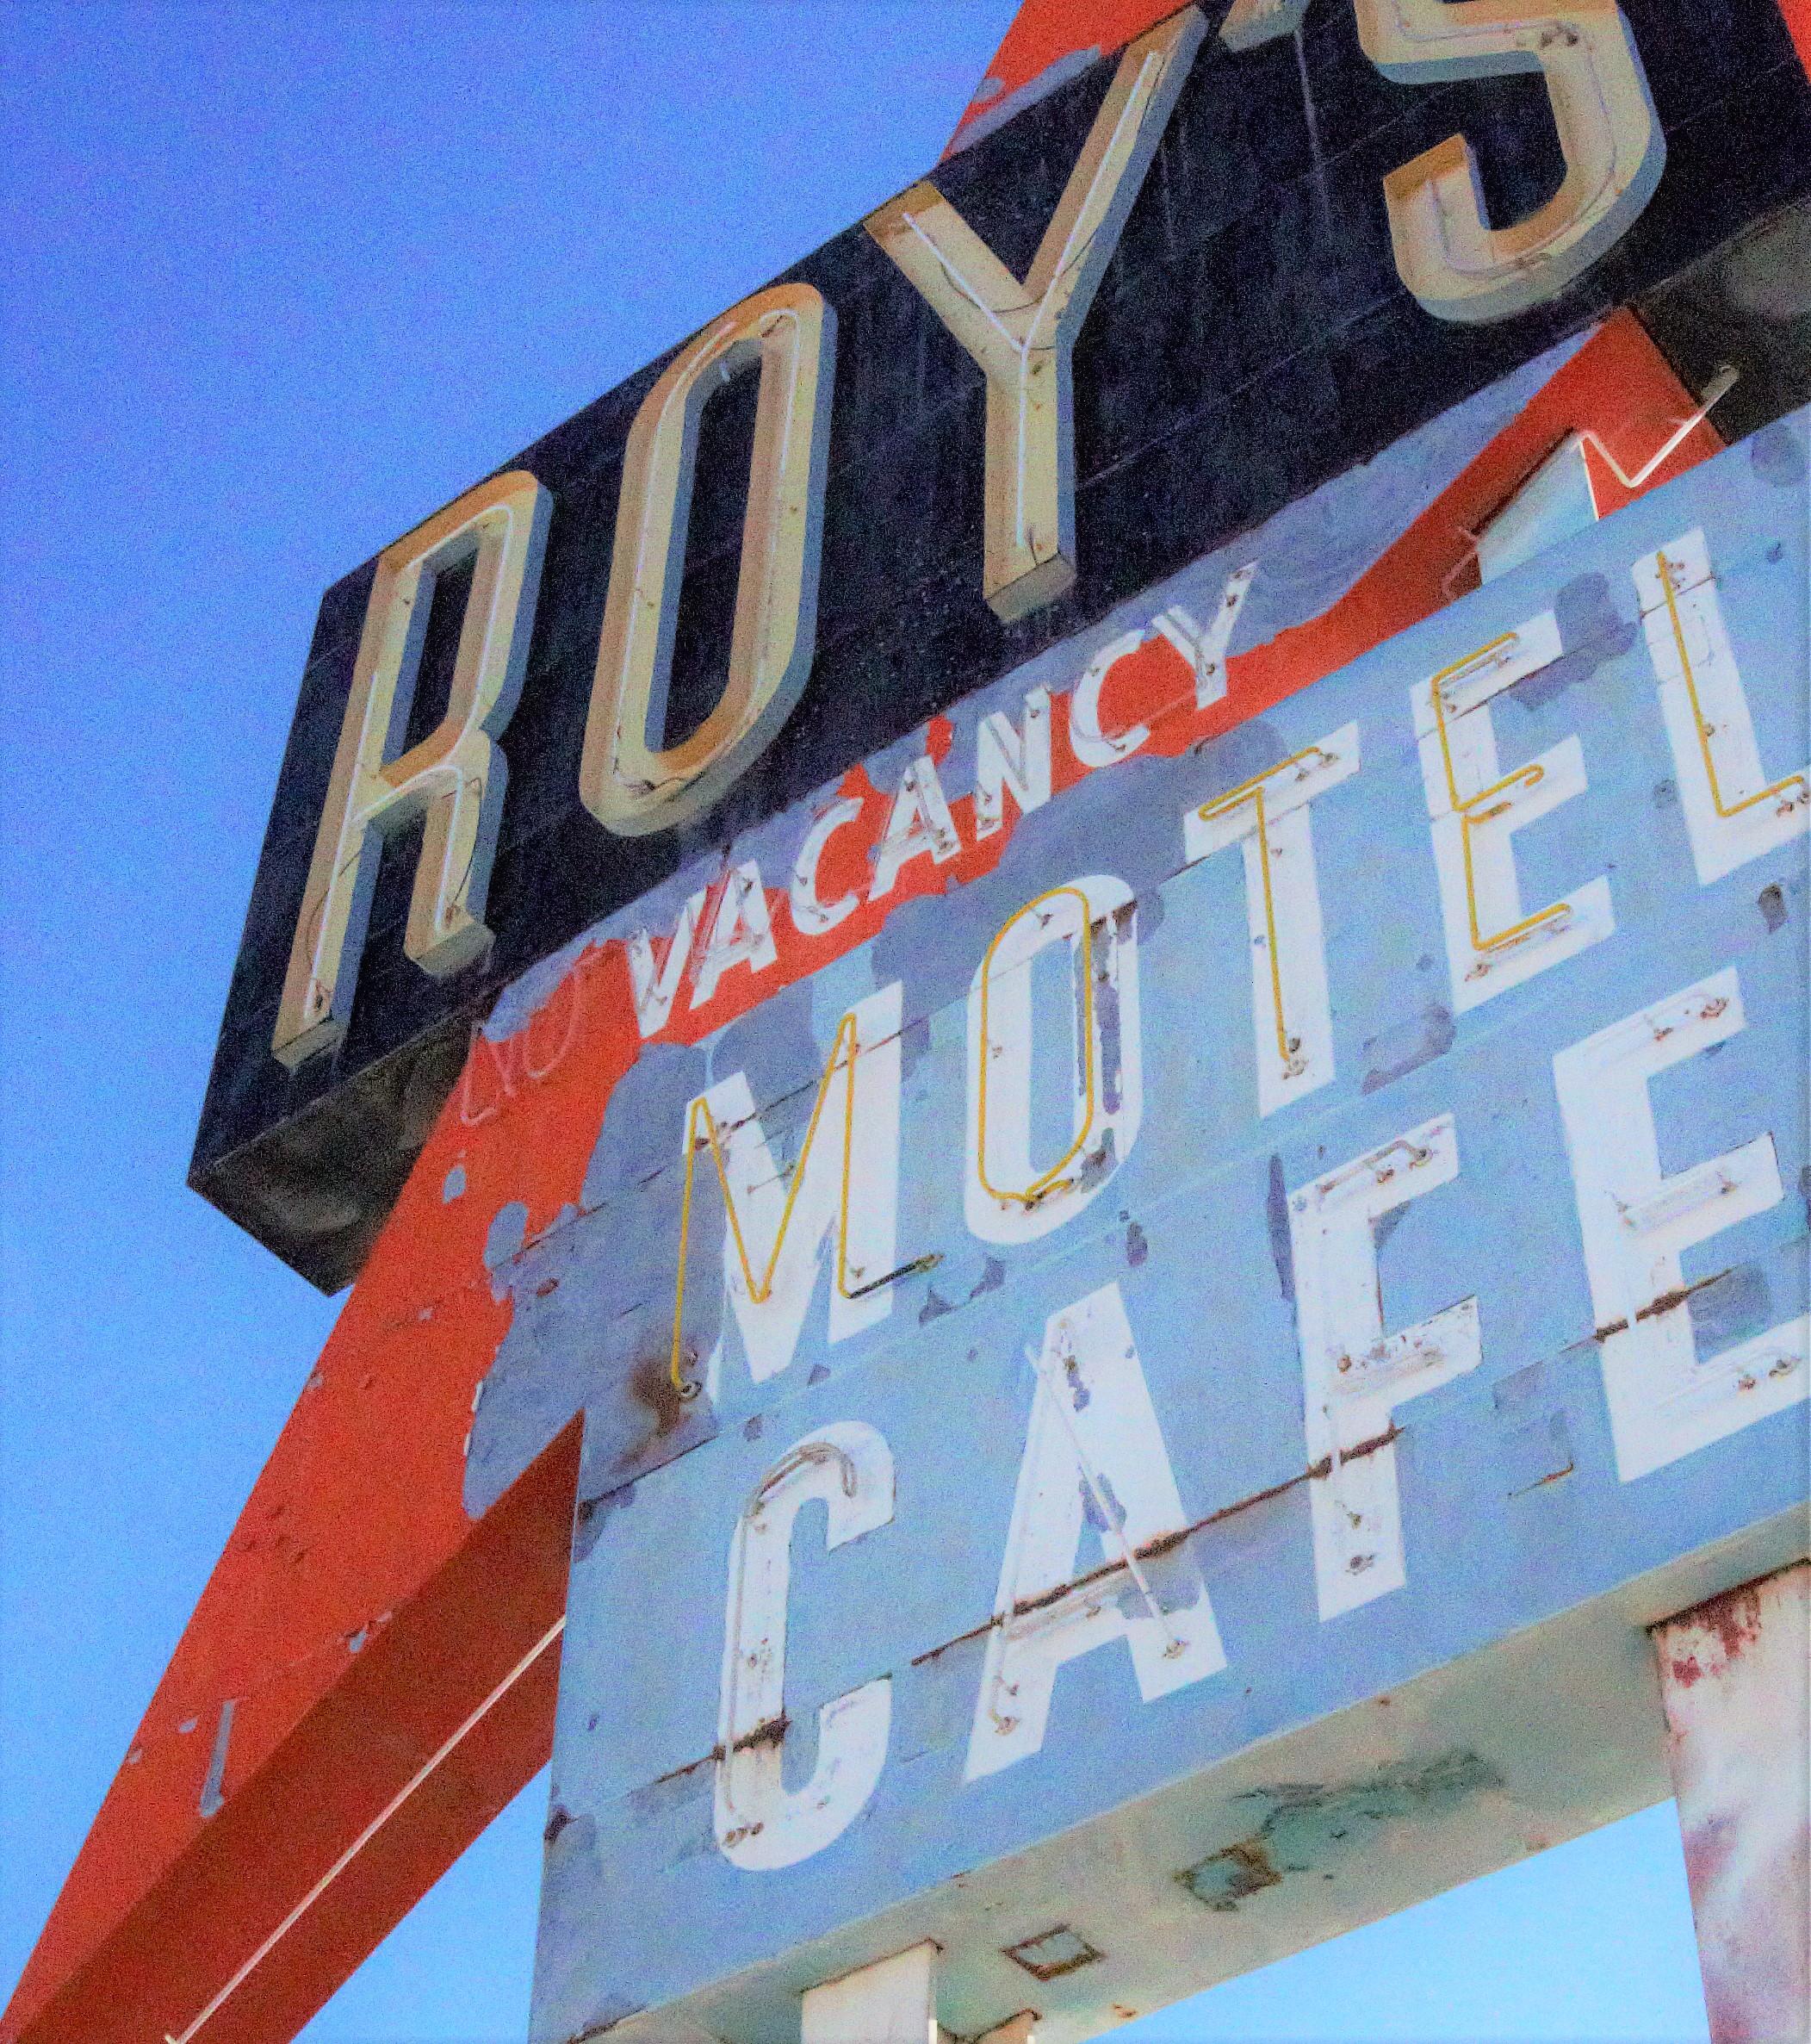 Roy's Vacancy Motel Cafe